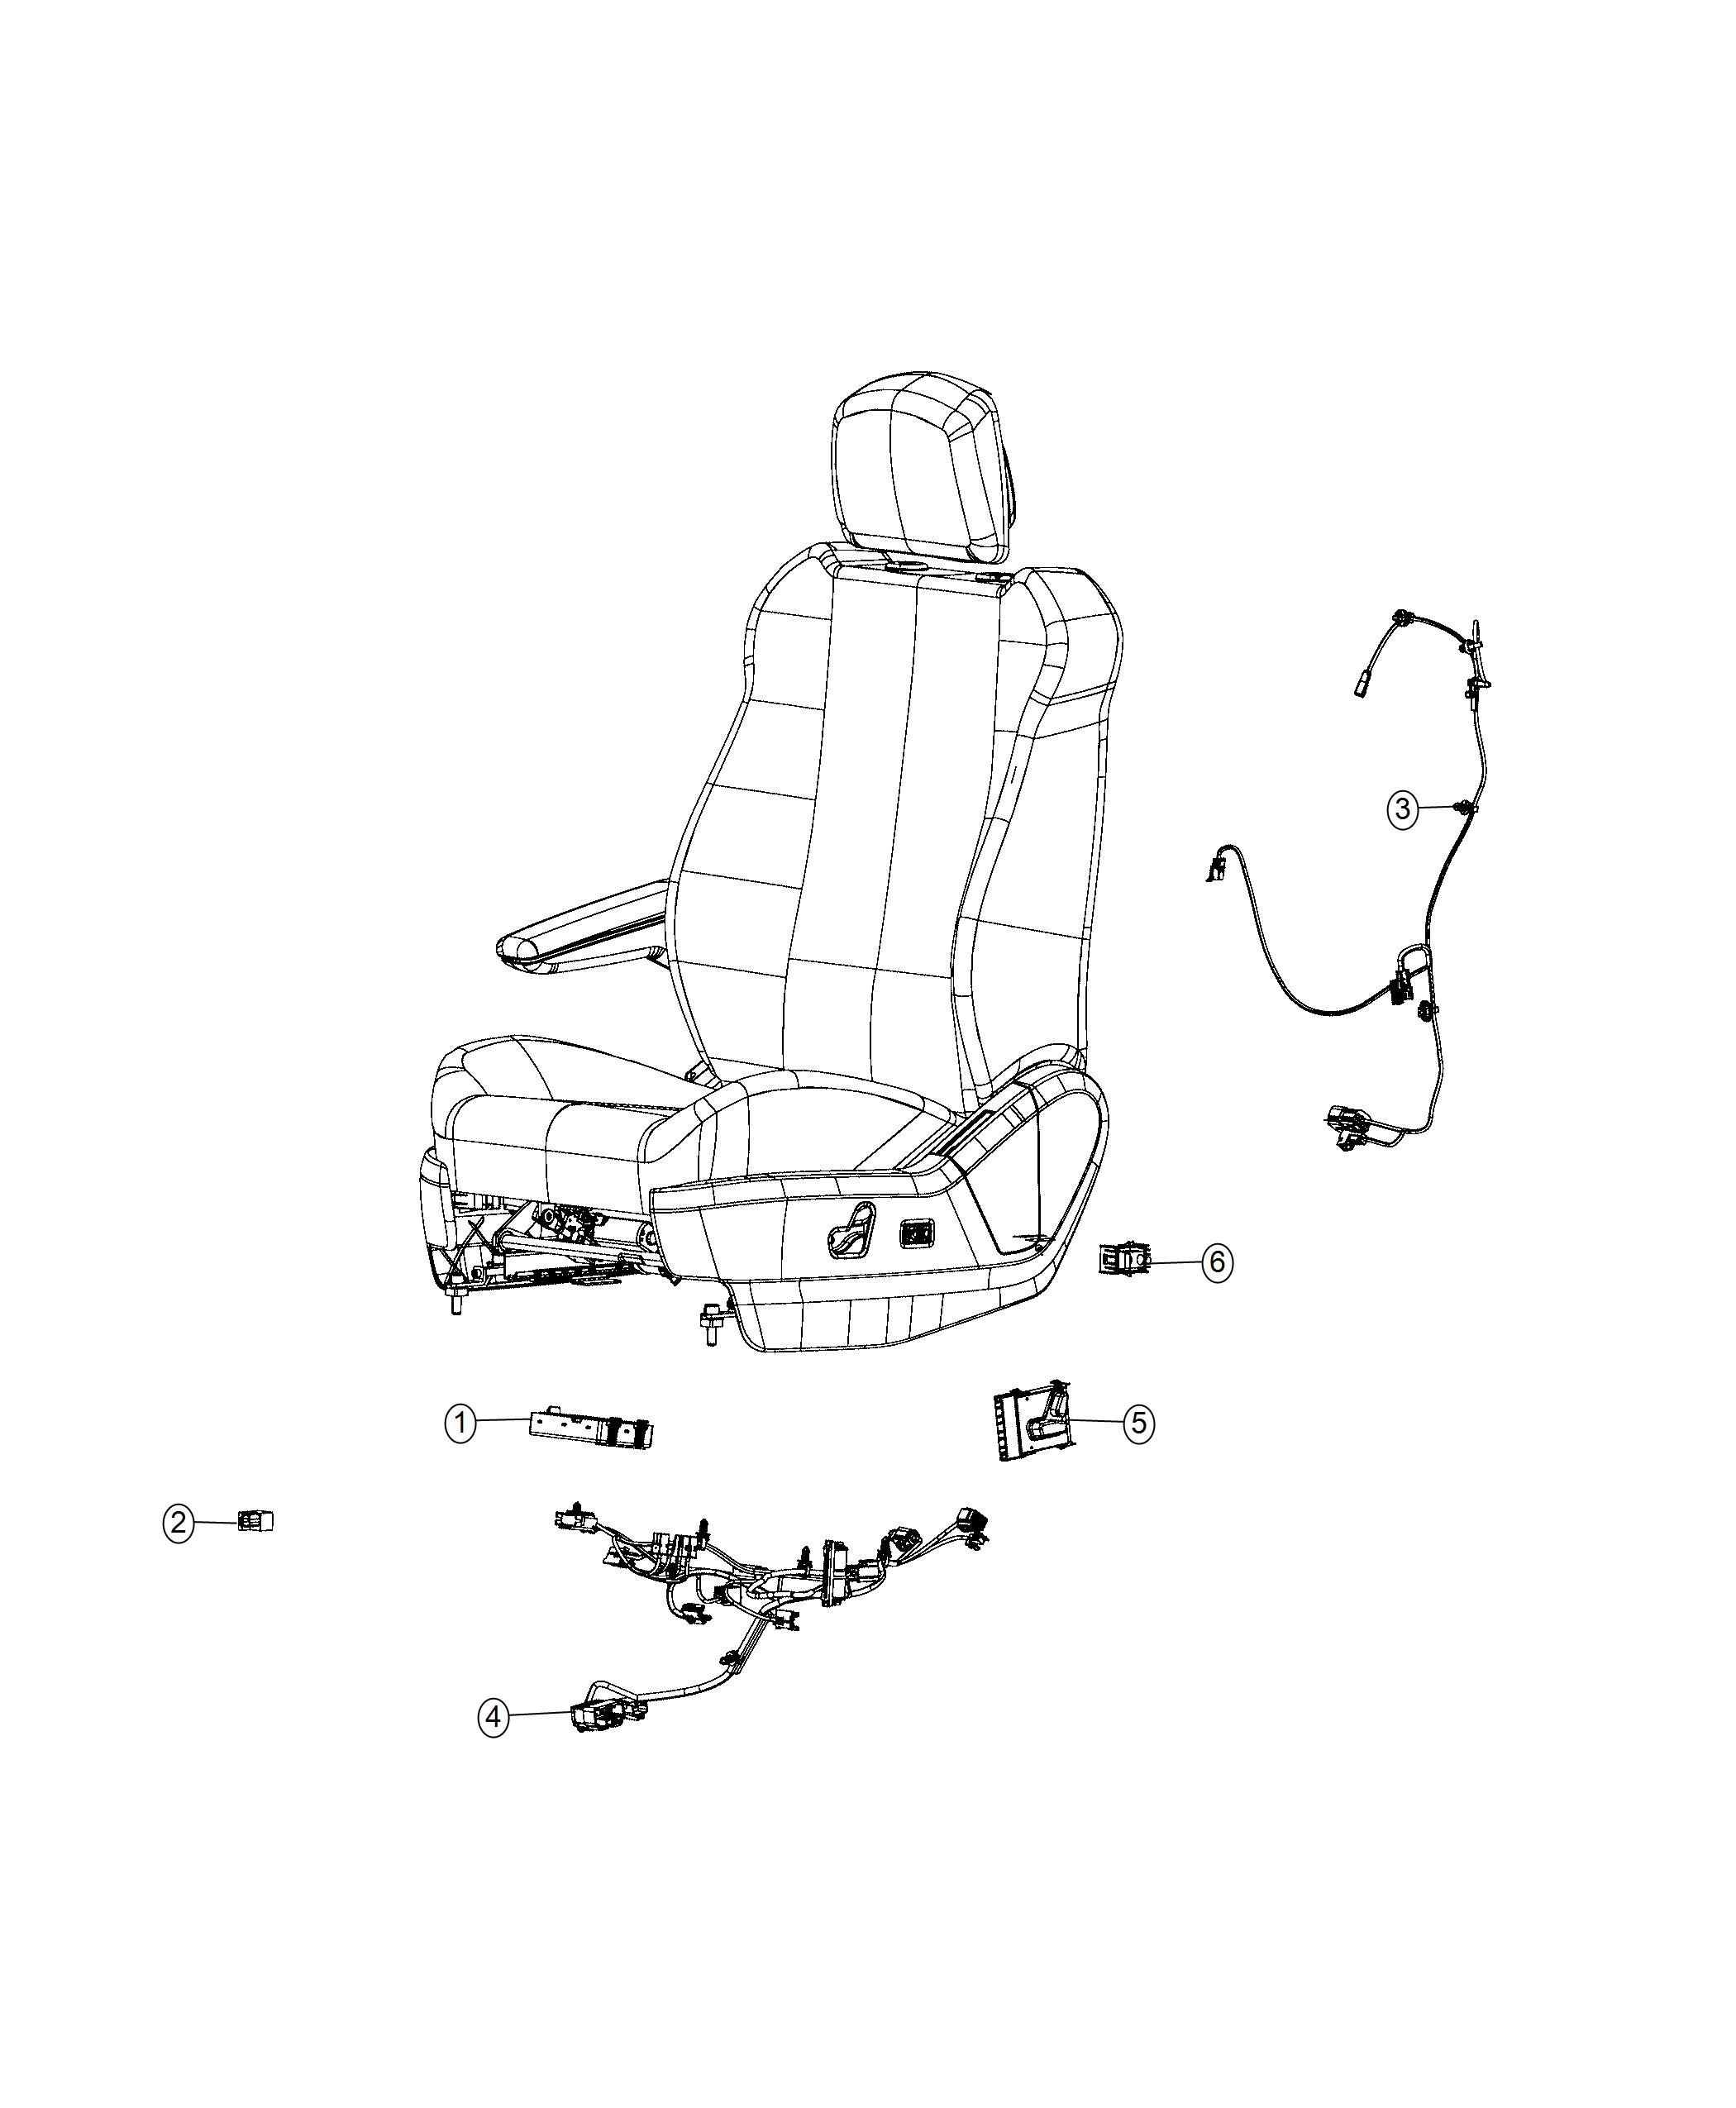 Dodge Grand Caravan Wiring Power Seat Seat Cushion